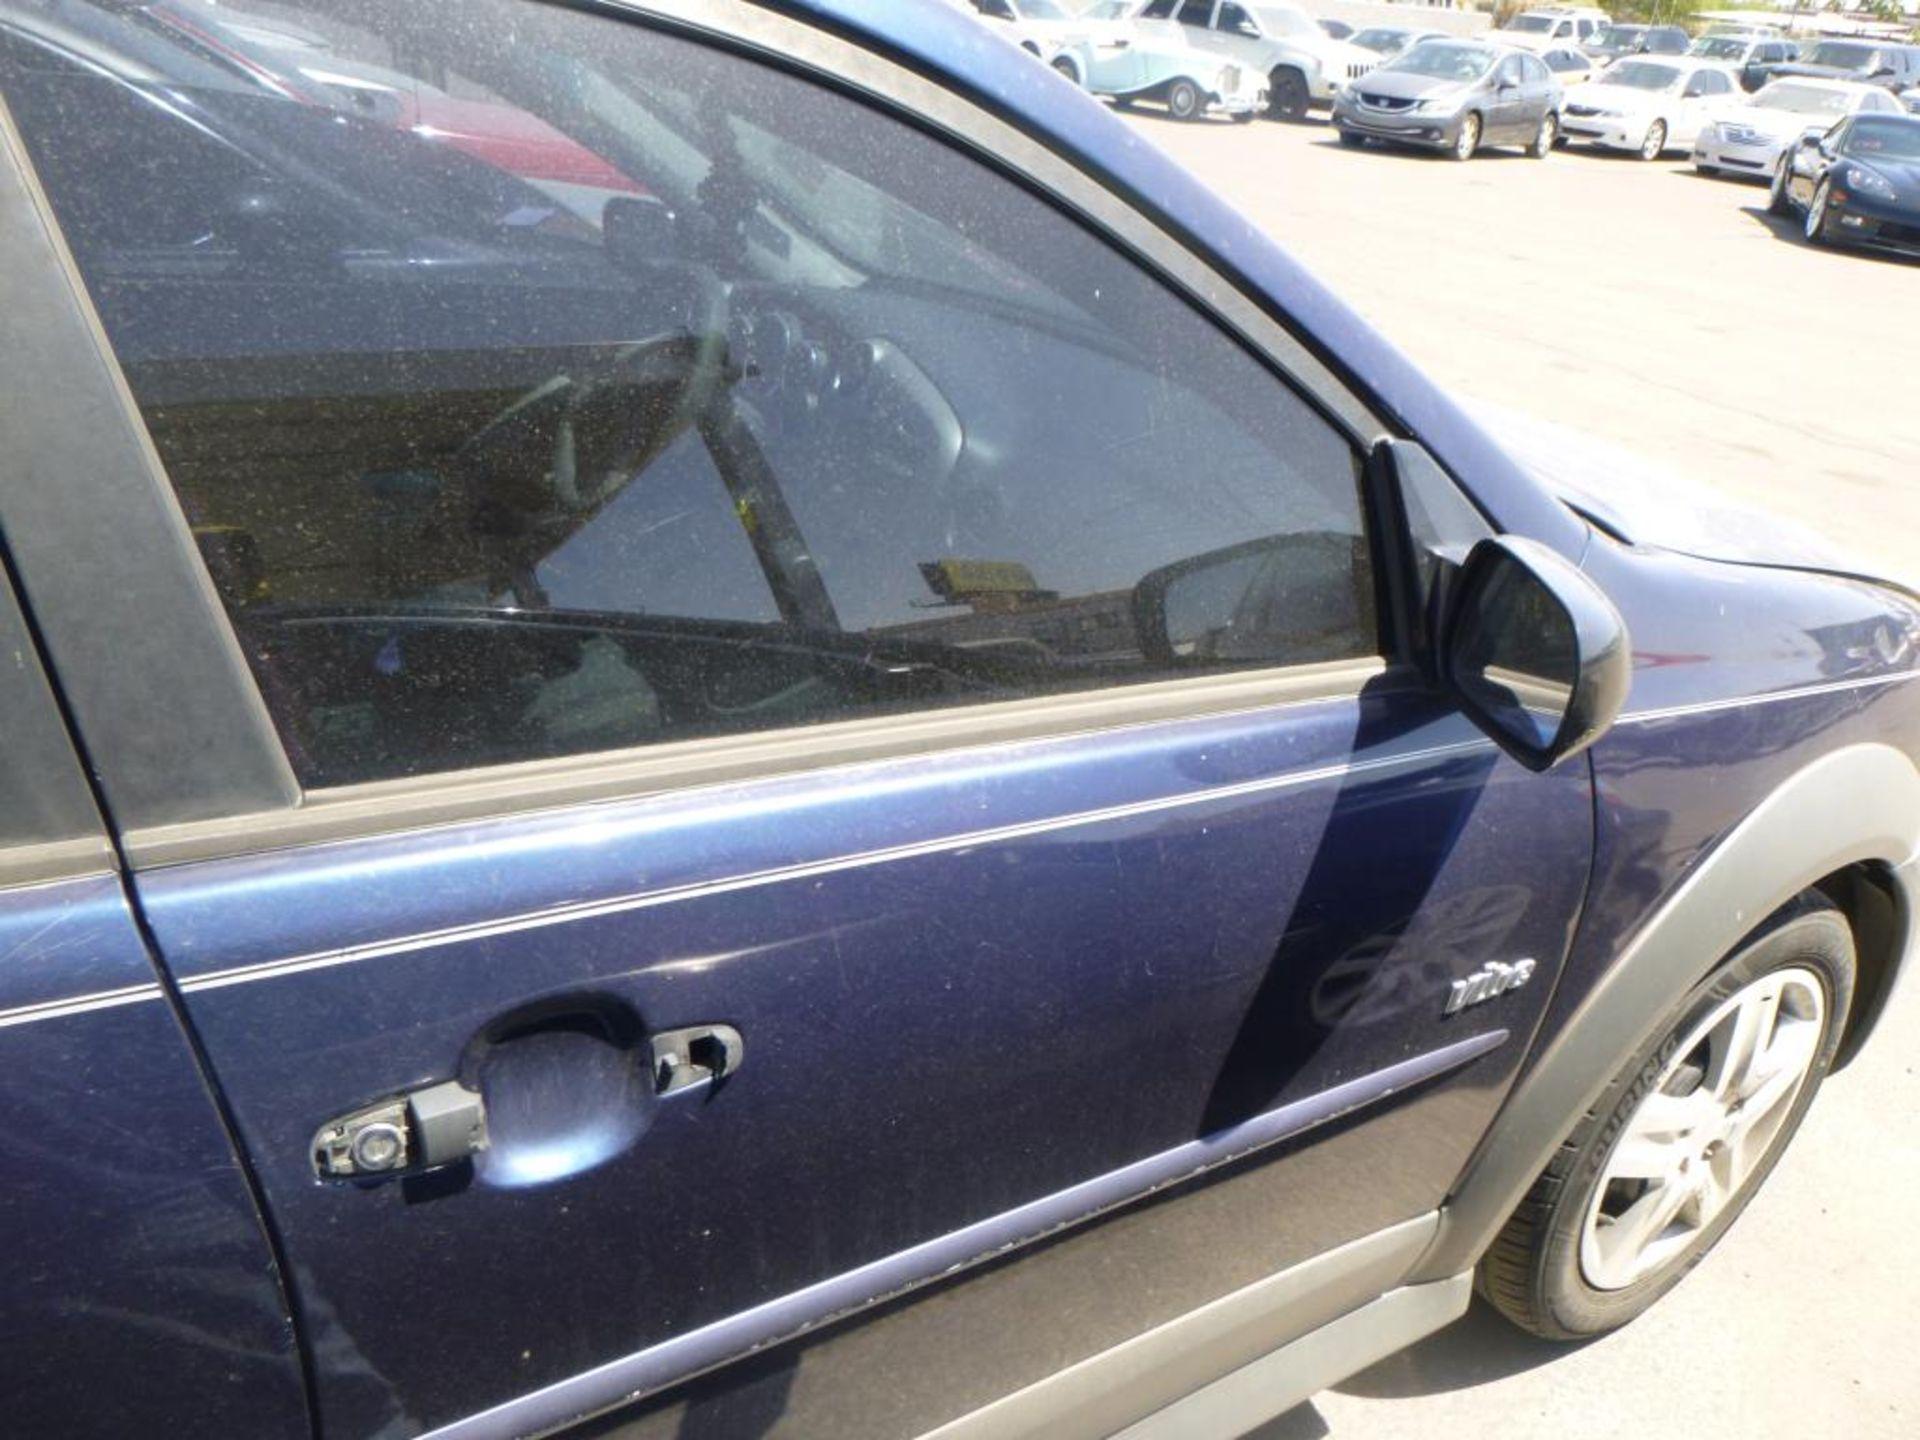 2006 Pontiac Vibe - Image 9 of 14